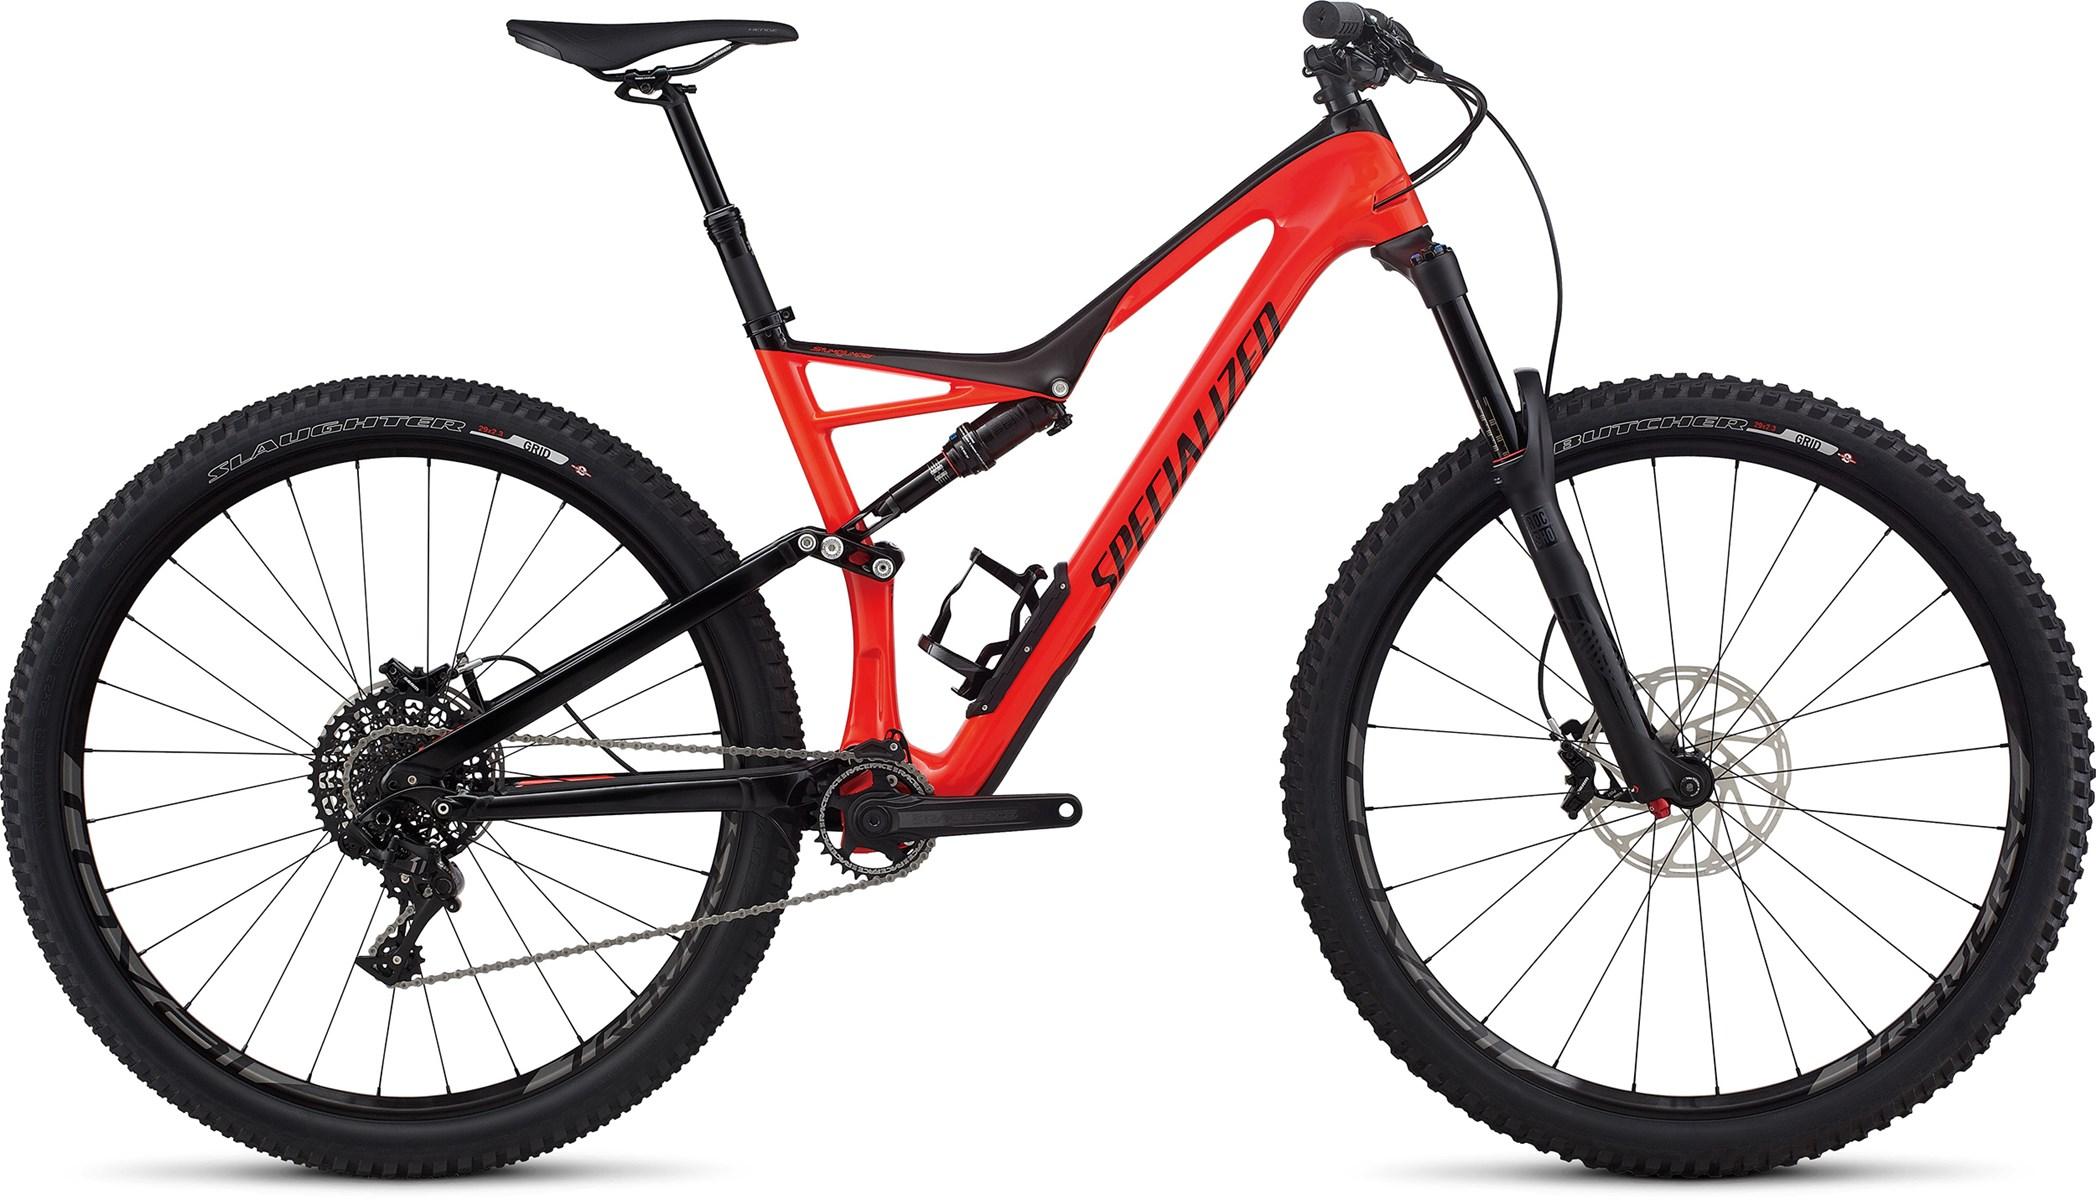 2017 Specialized Stumpjumper FSR Expert Carbon 29er Mountain Bike ...